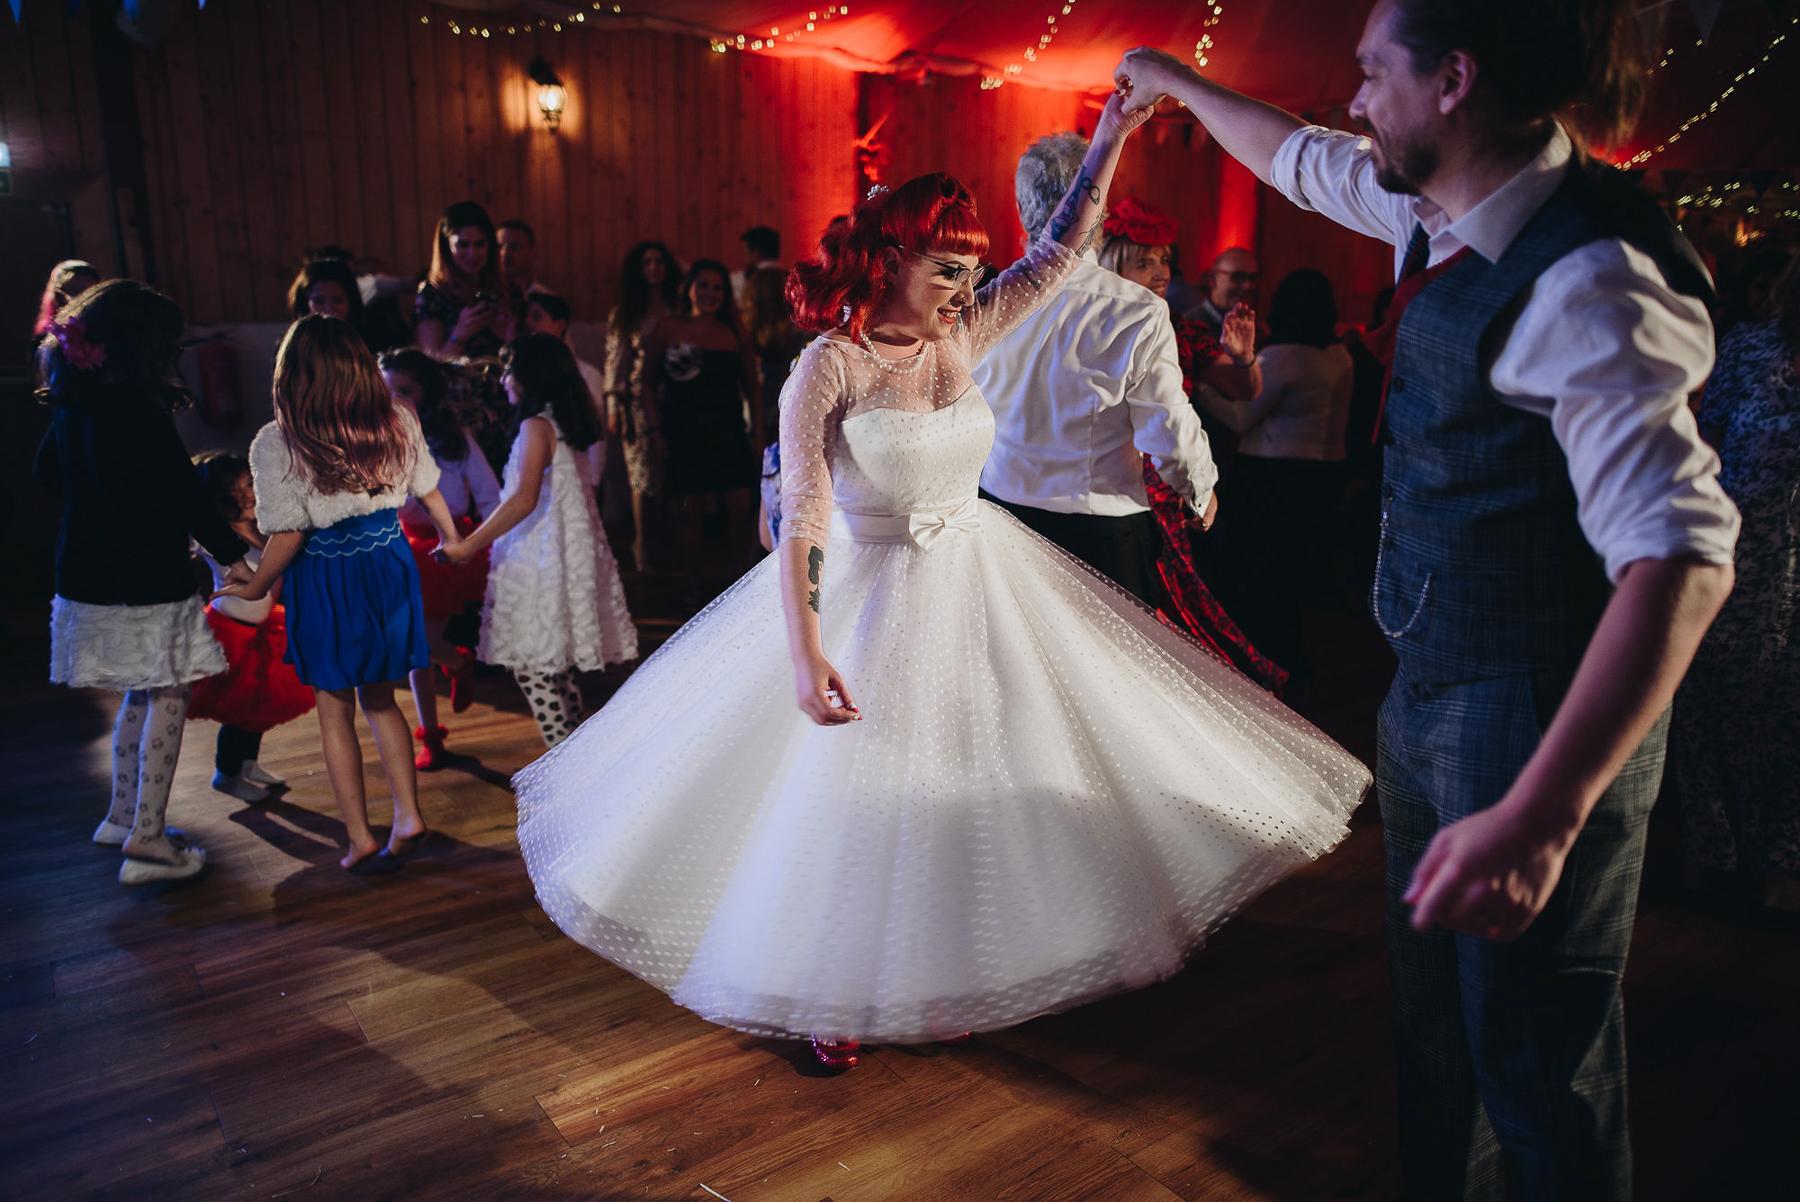 Wellbeing_Farm_Wedding_Photography_The_Pin-Up_Bride_Lara_Shaun-153.jpg